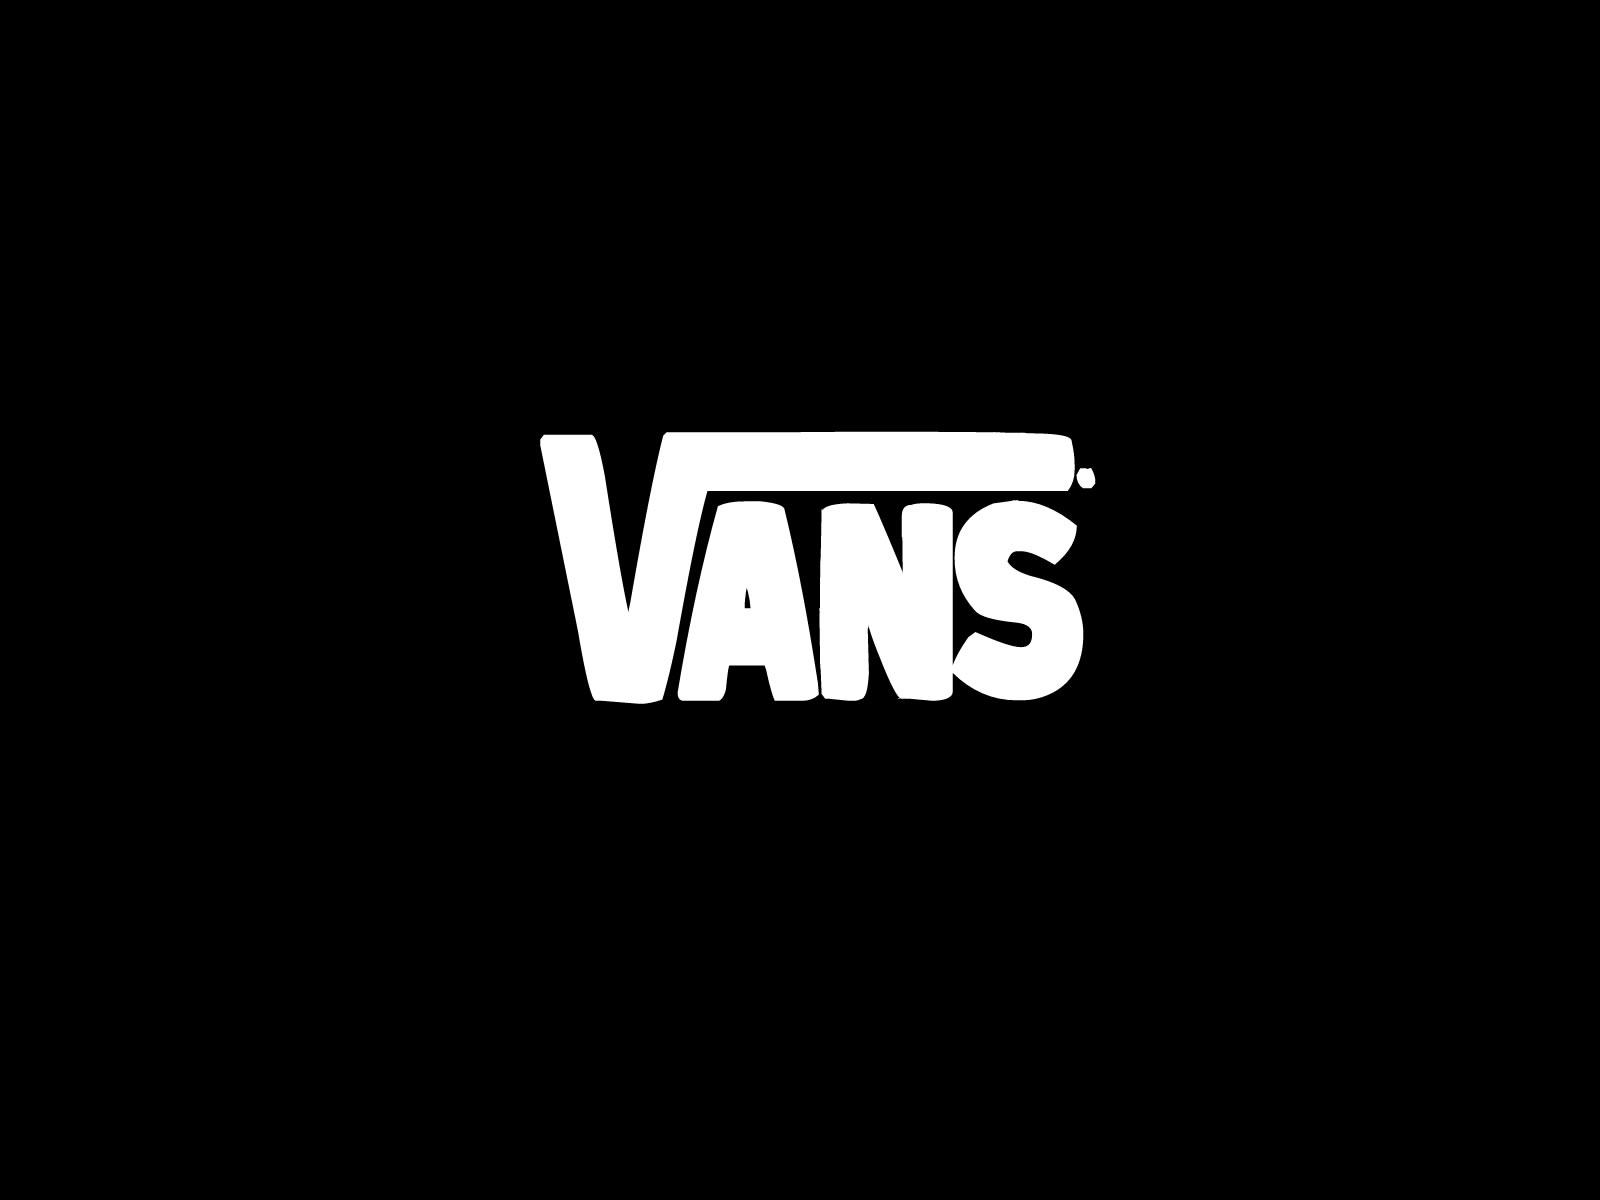 vans logo computer wallpaper 51883